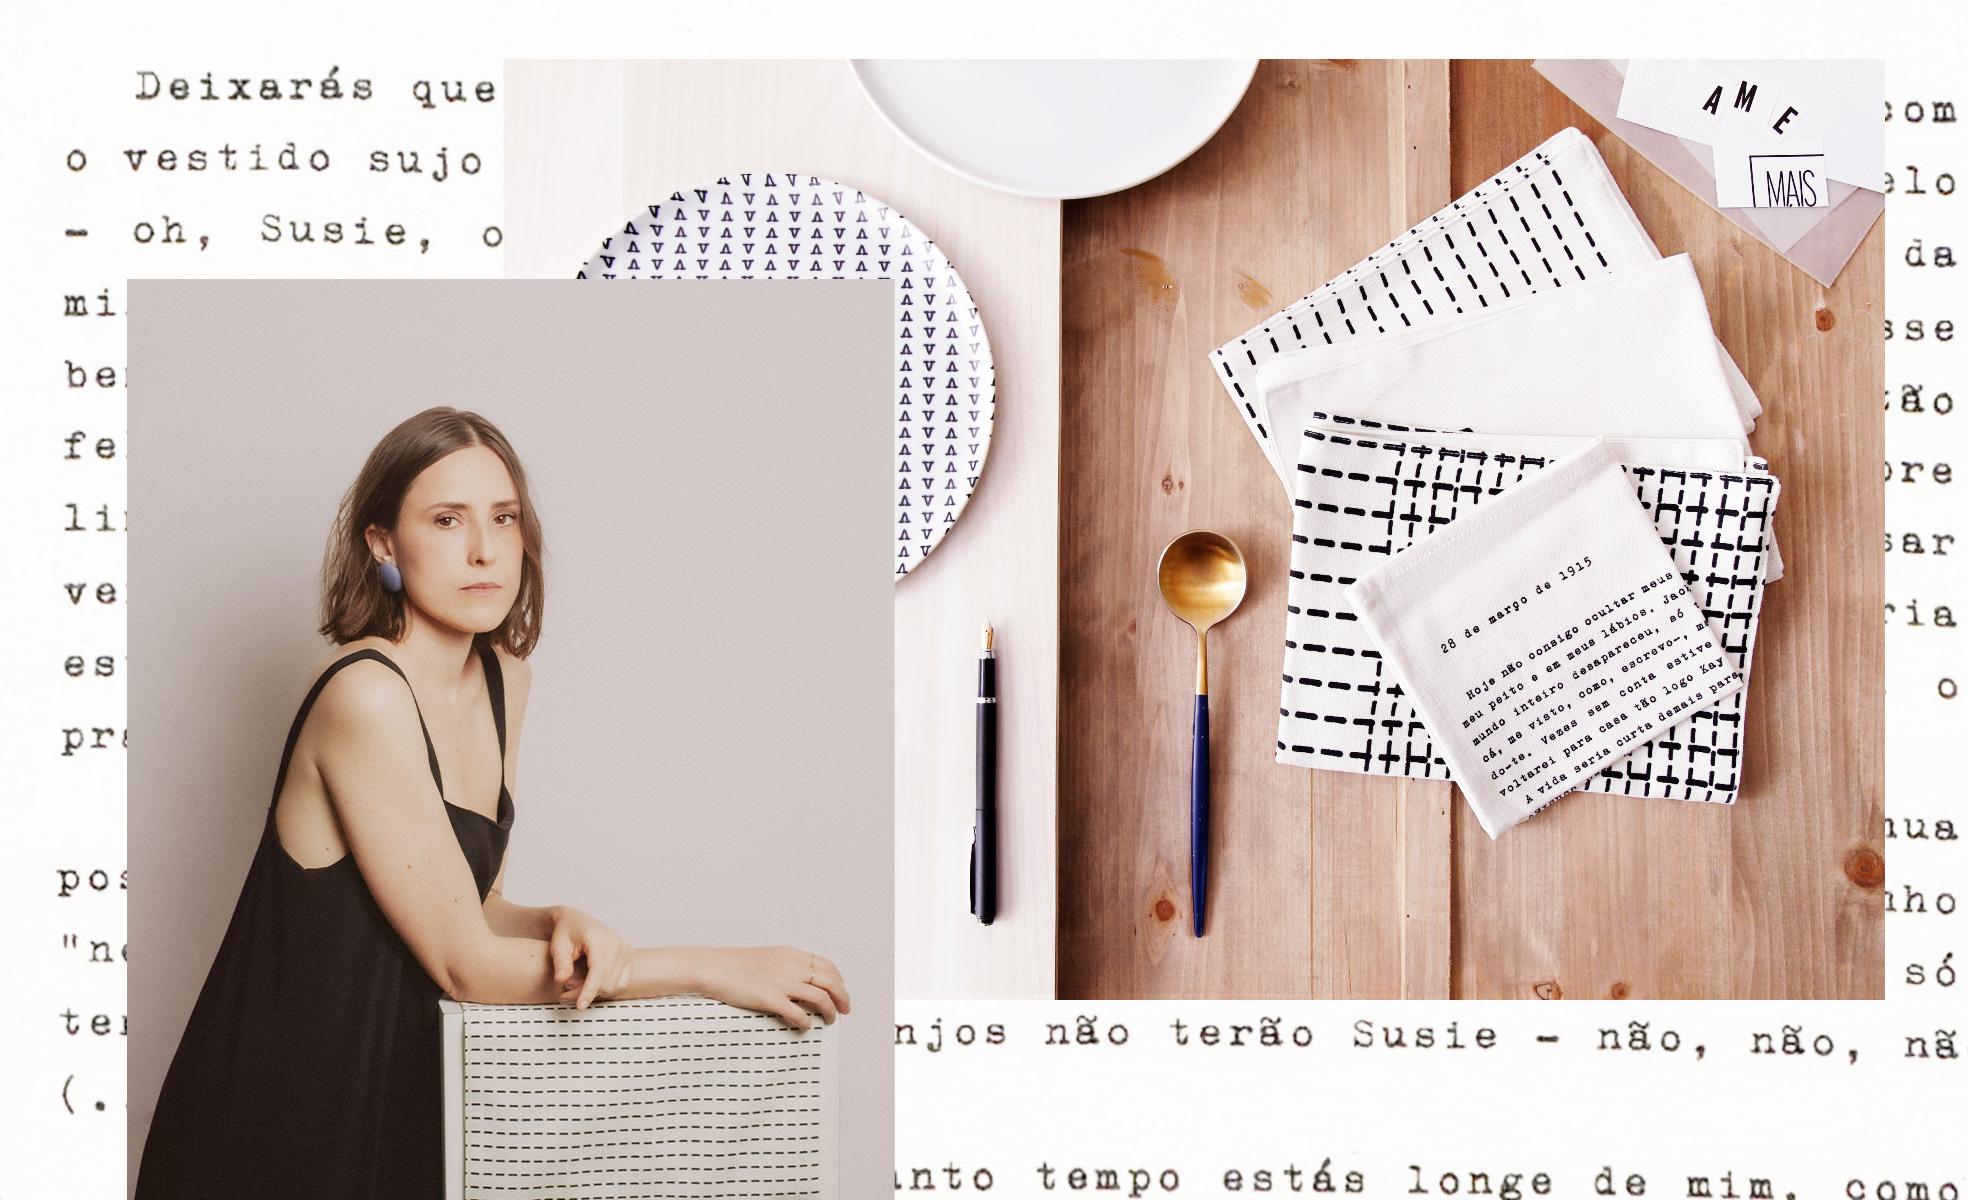 Verena Smit, multiartista | westwing.com.br